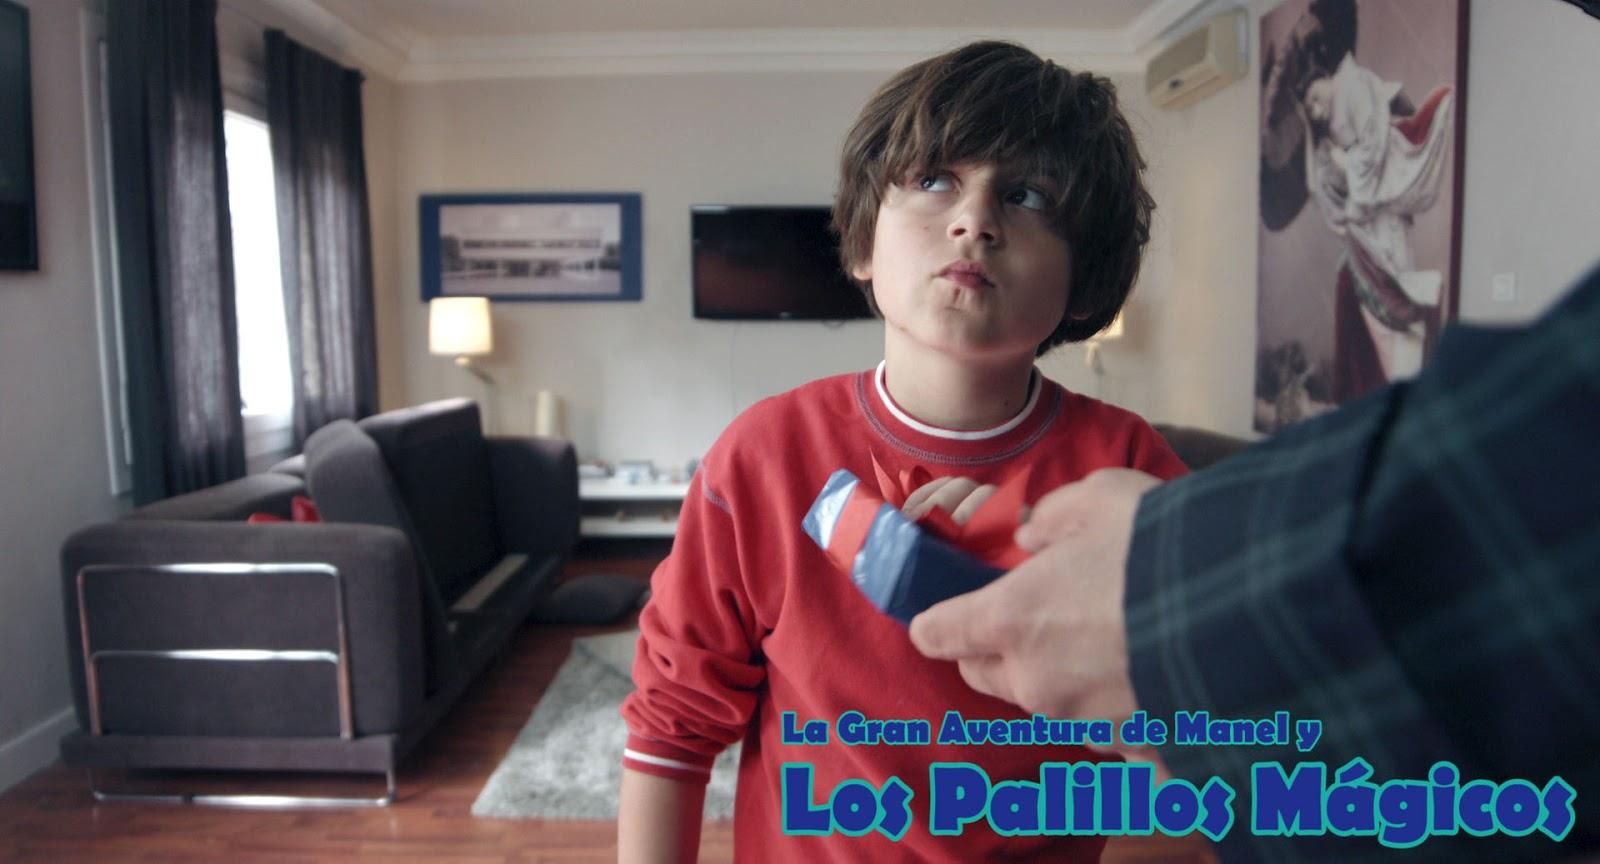 Spin the bottle video argon adolescentes